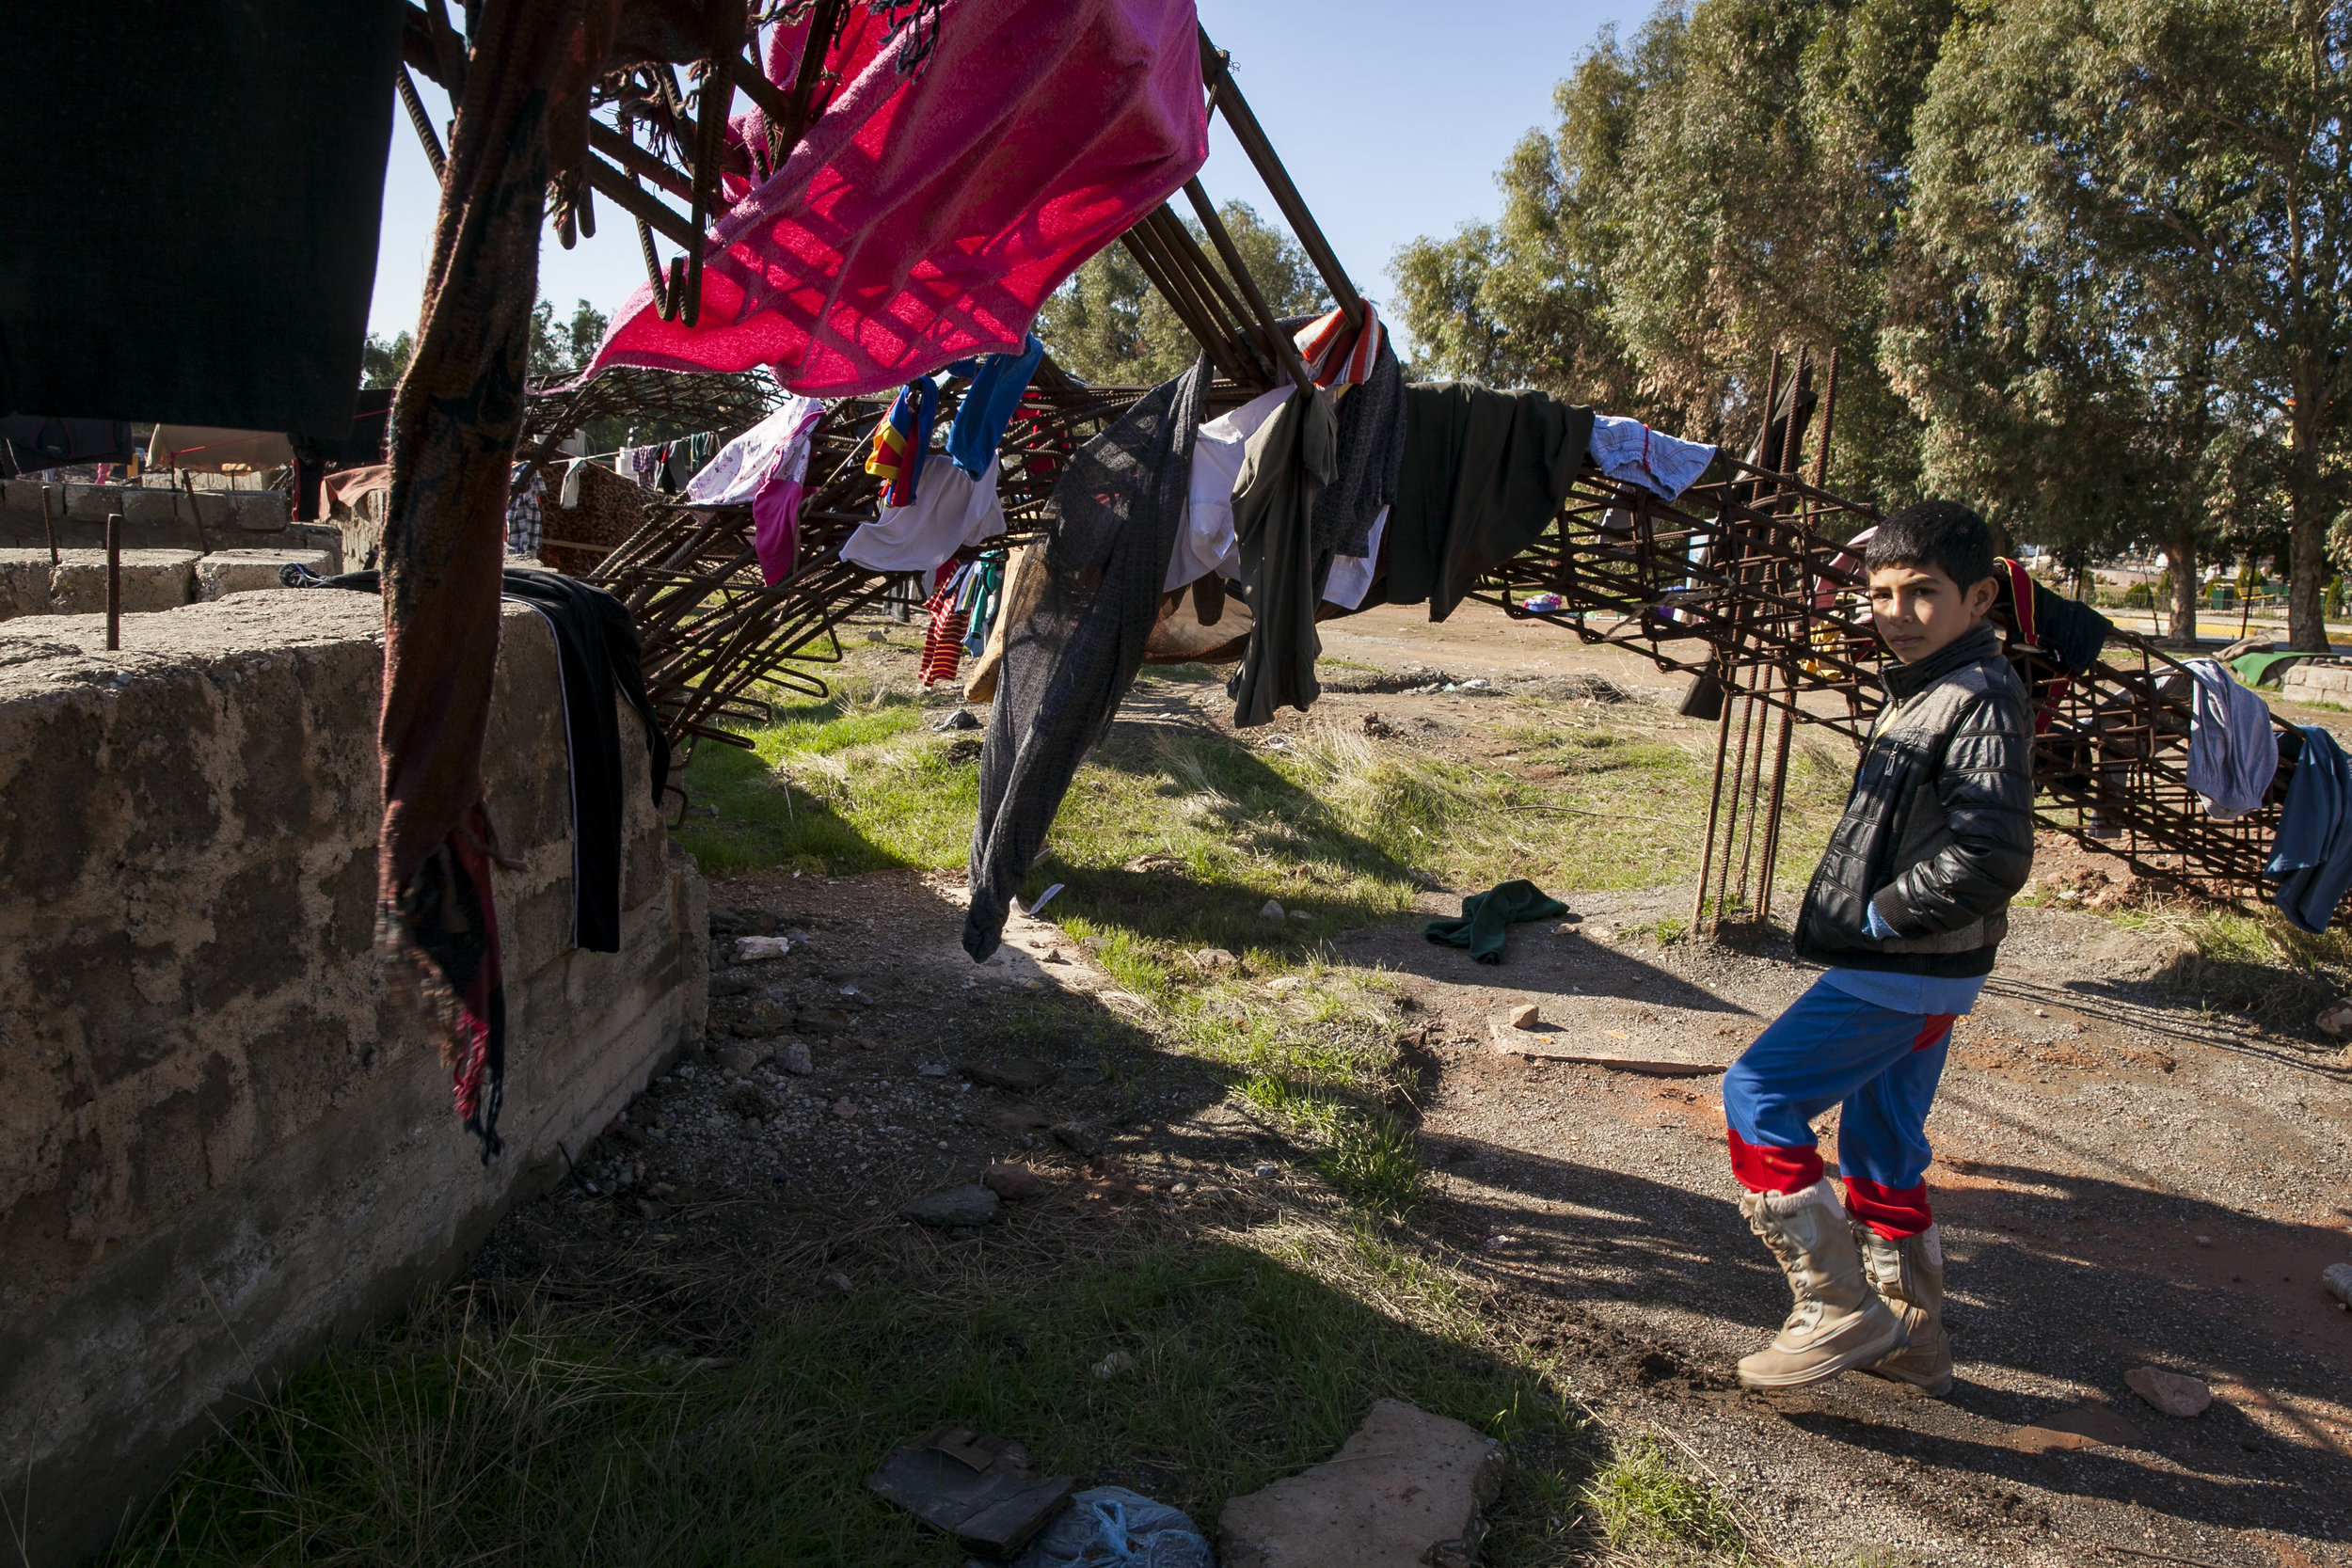 20141204_Refugees_GH_0130.jpg